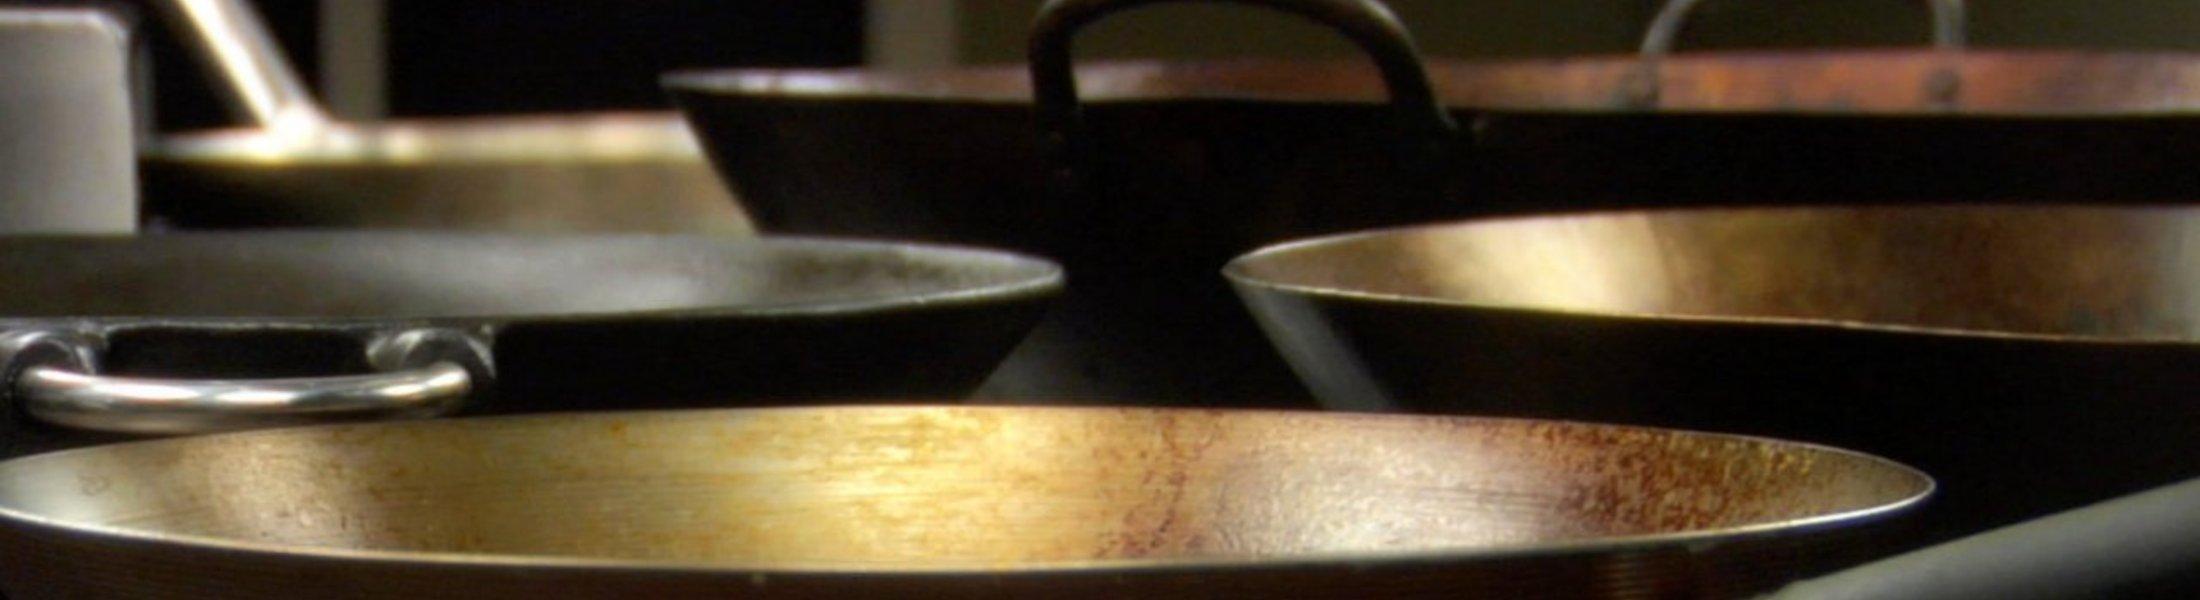 Art of the Wok: Stir-Frying